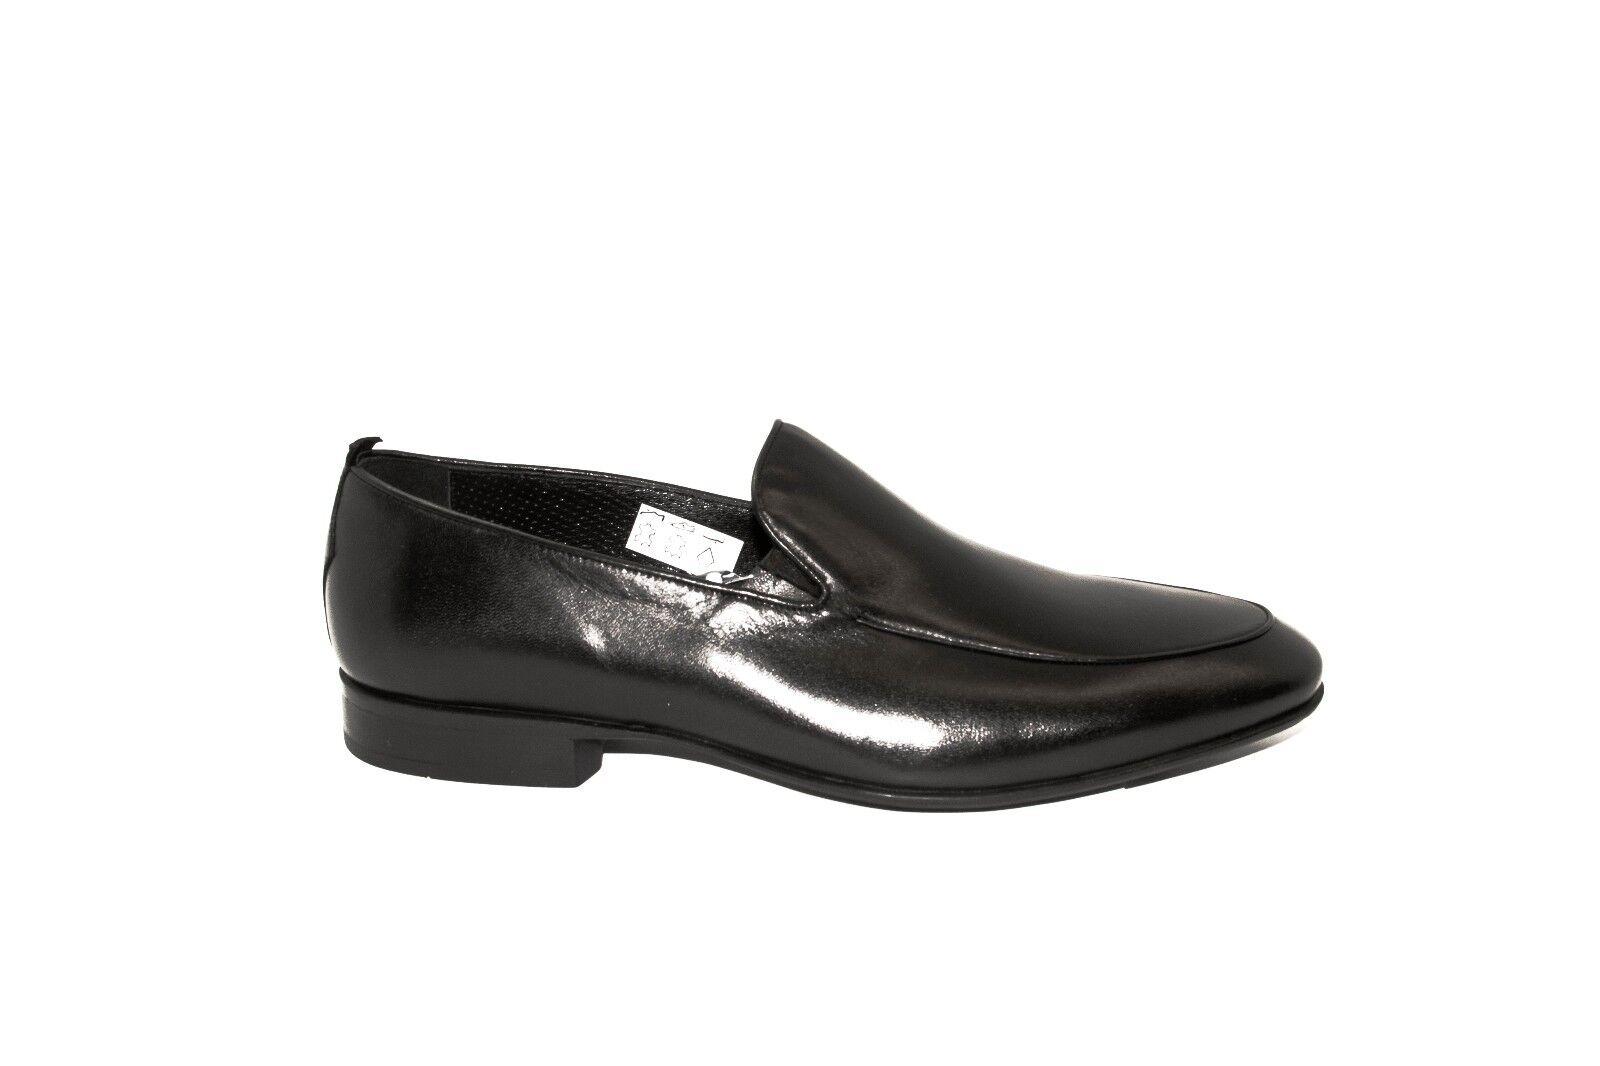 Rossi 1386PR Uomo Uomo Uomo nero Leather Slip On scarpe dc811b